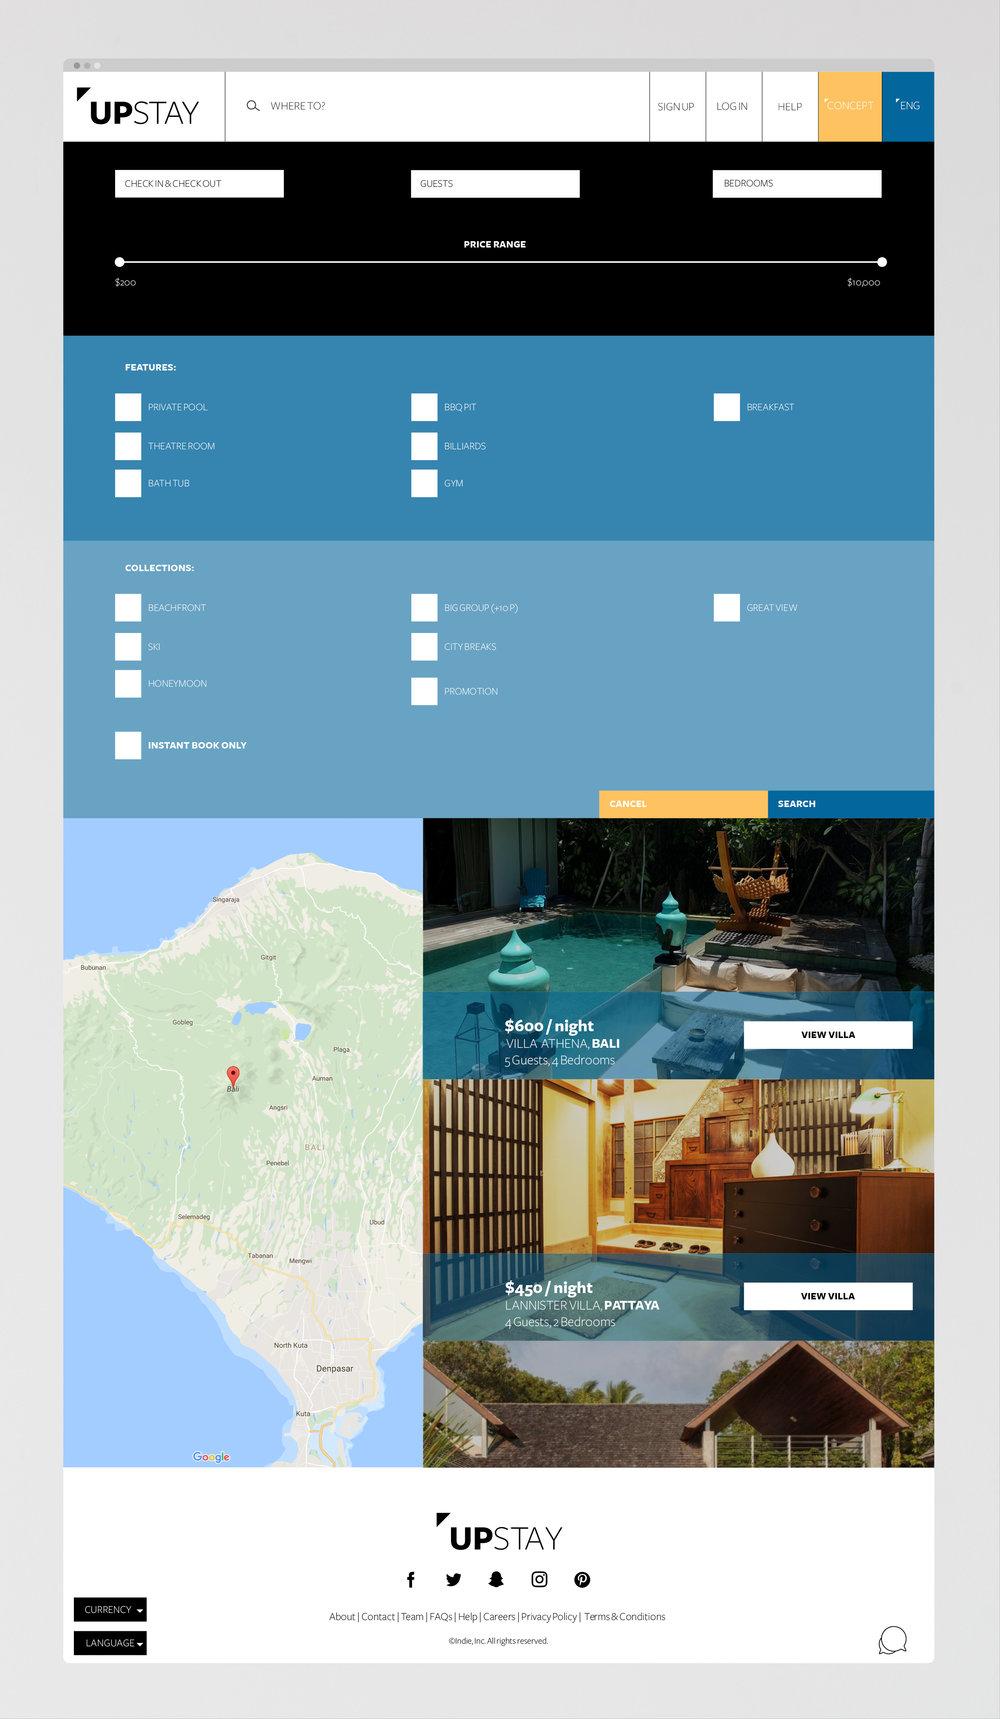 upstay_page-2.jpg